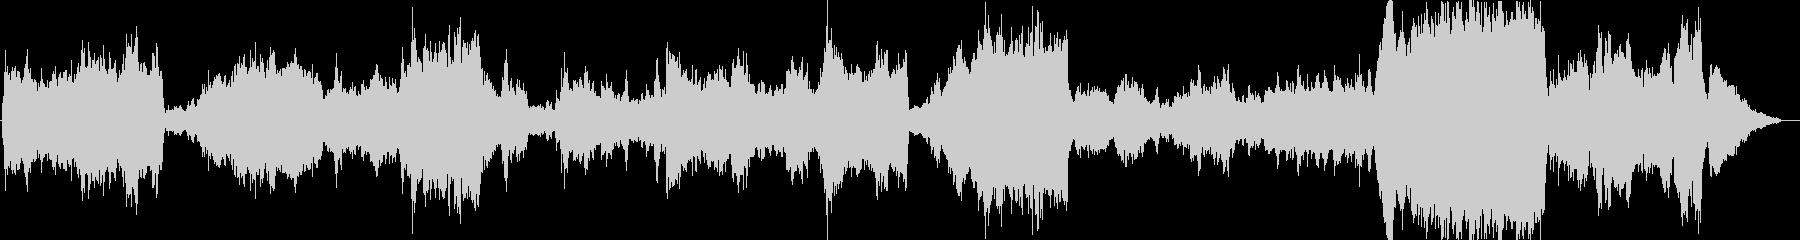 FFタクティクスの世界観でオーケストラ曲の未再生の波形